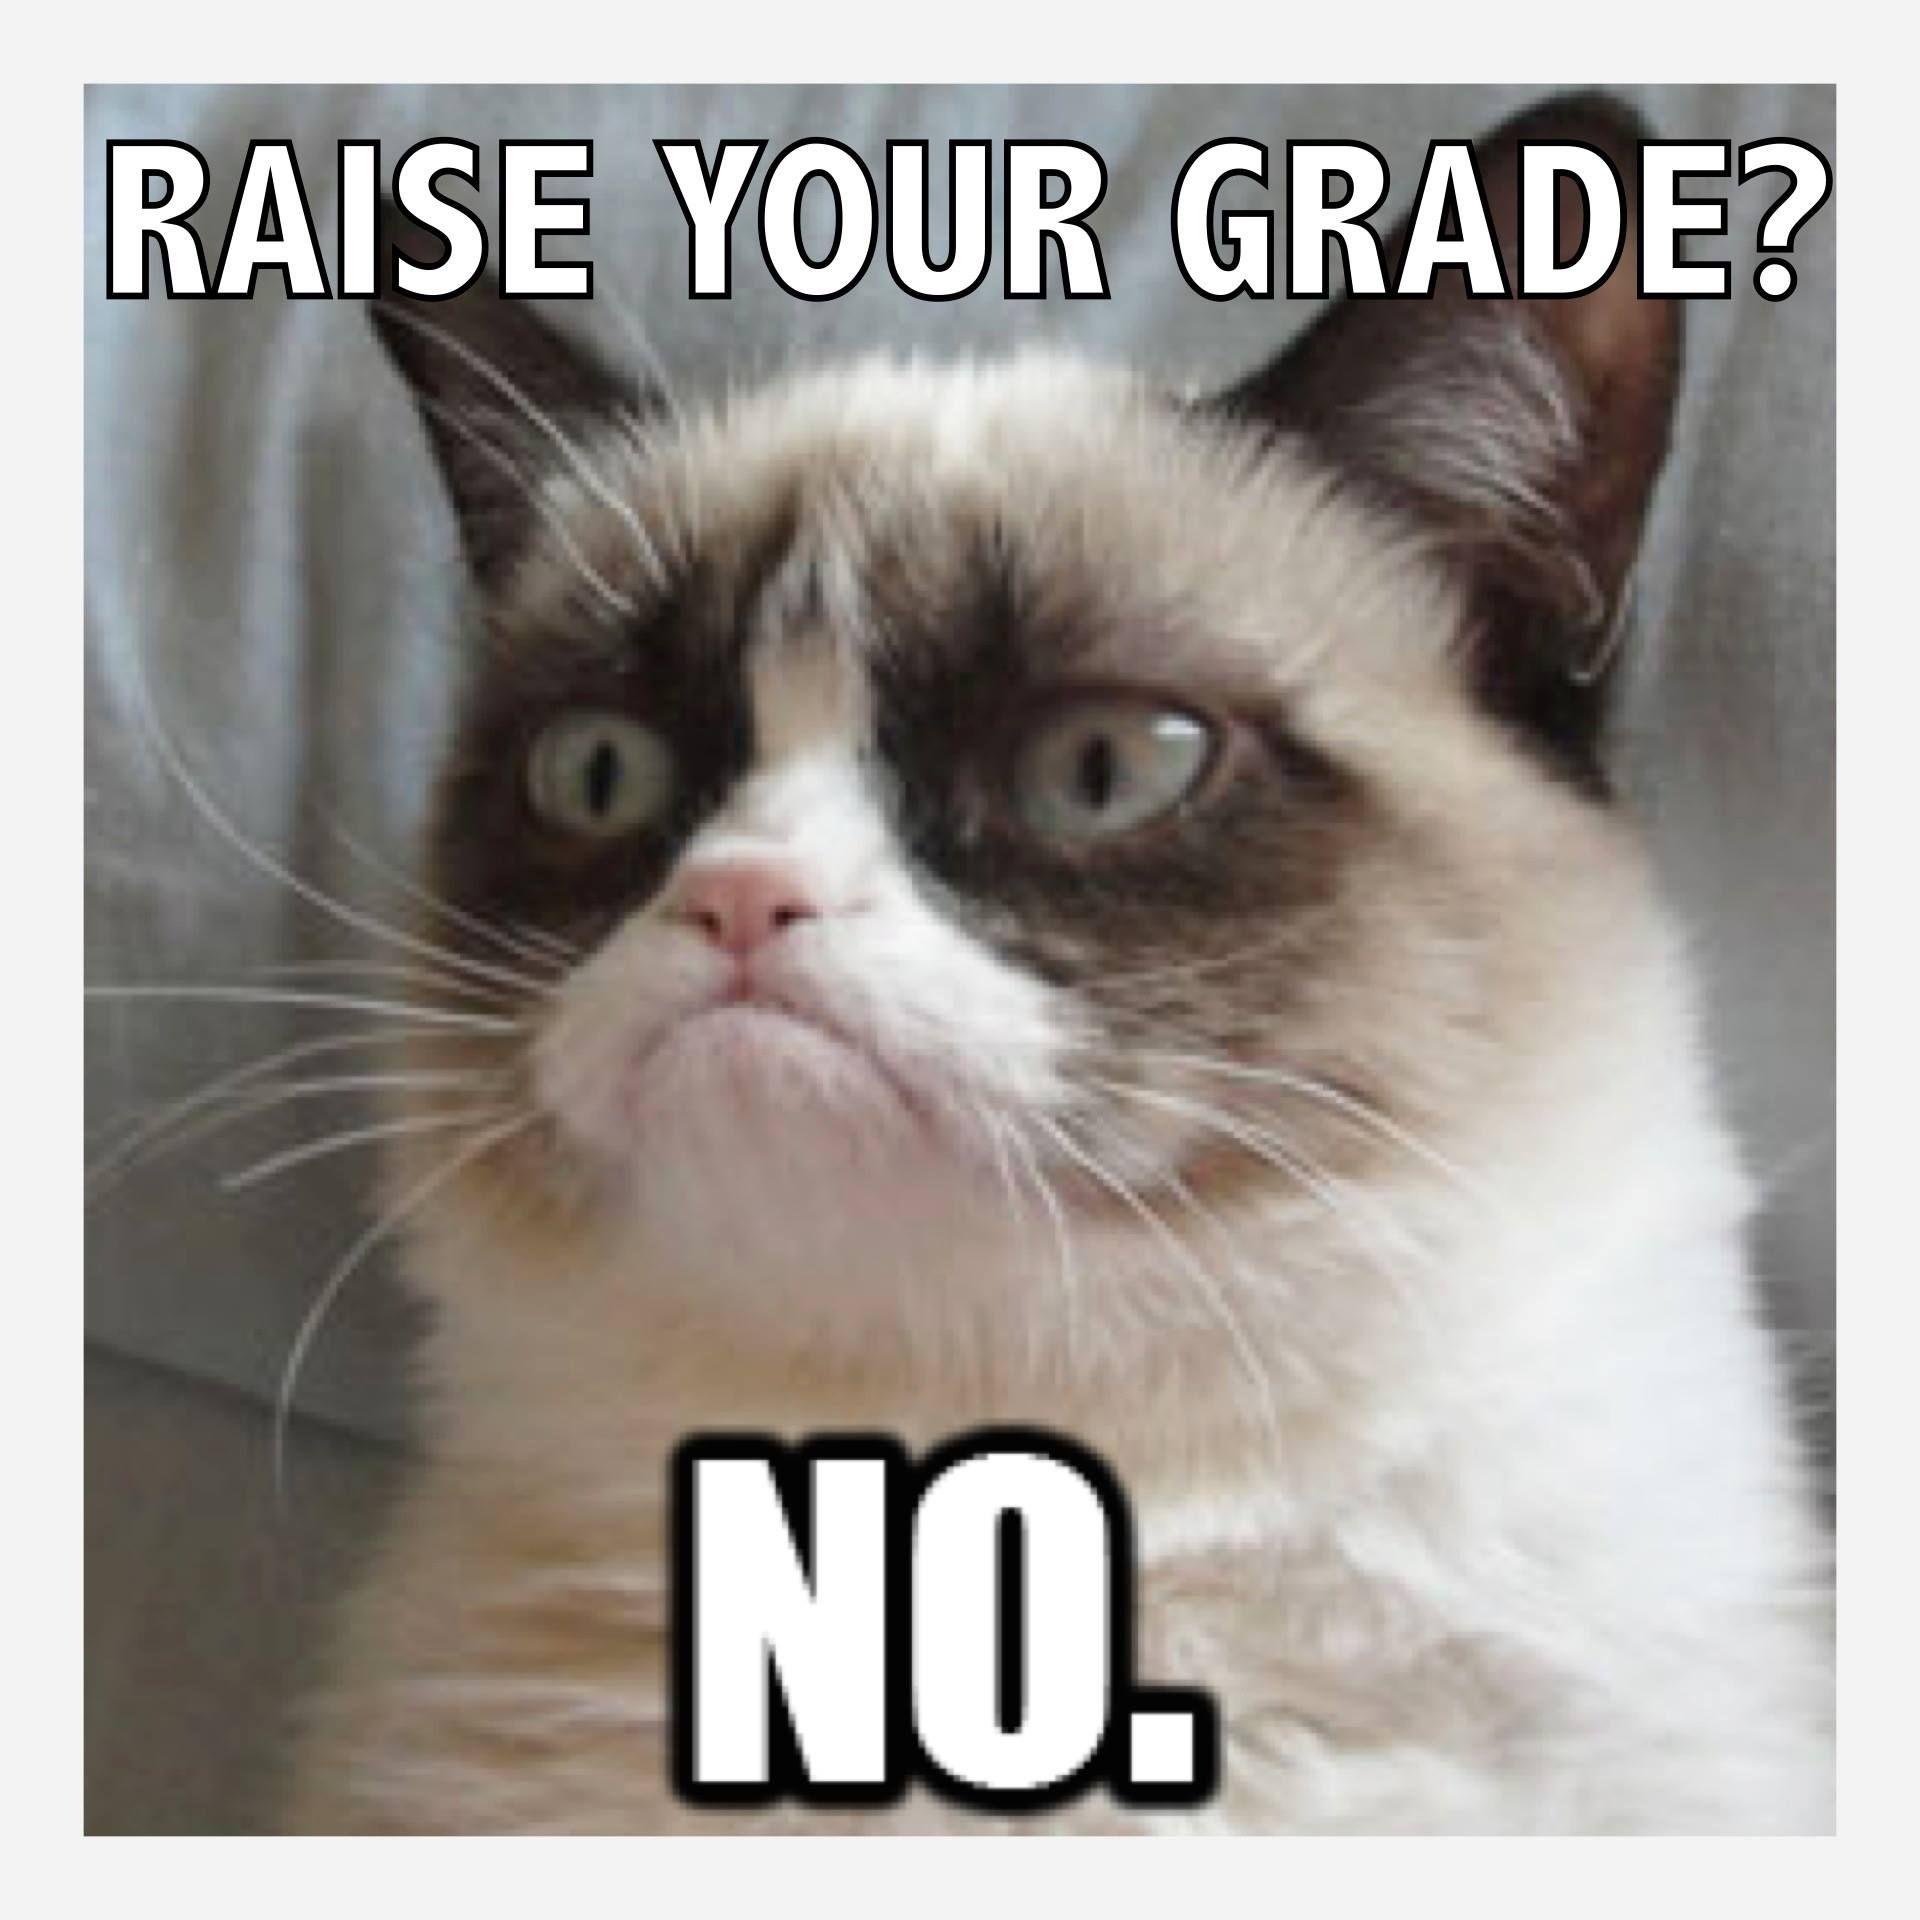 grumpy cat riase grade grading teaching lols cats grumpy cat riase grade